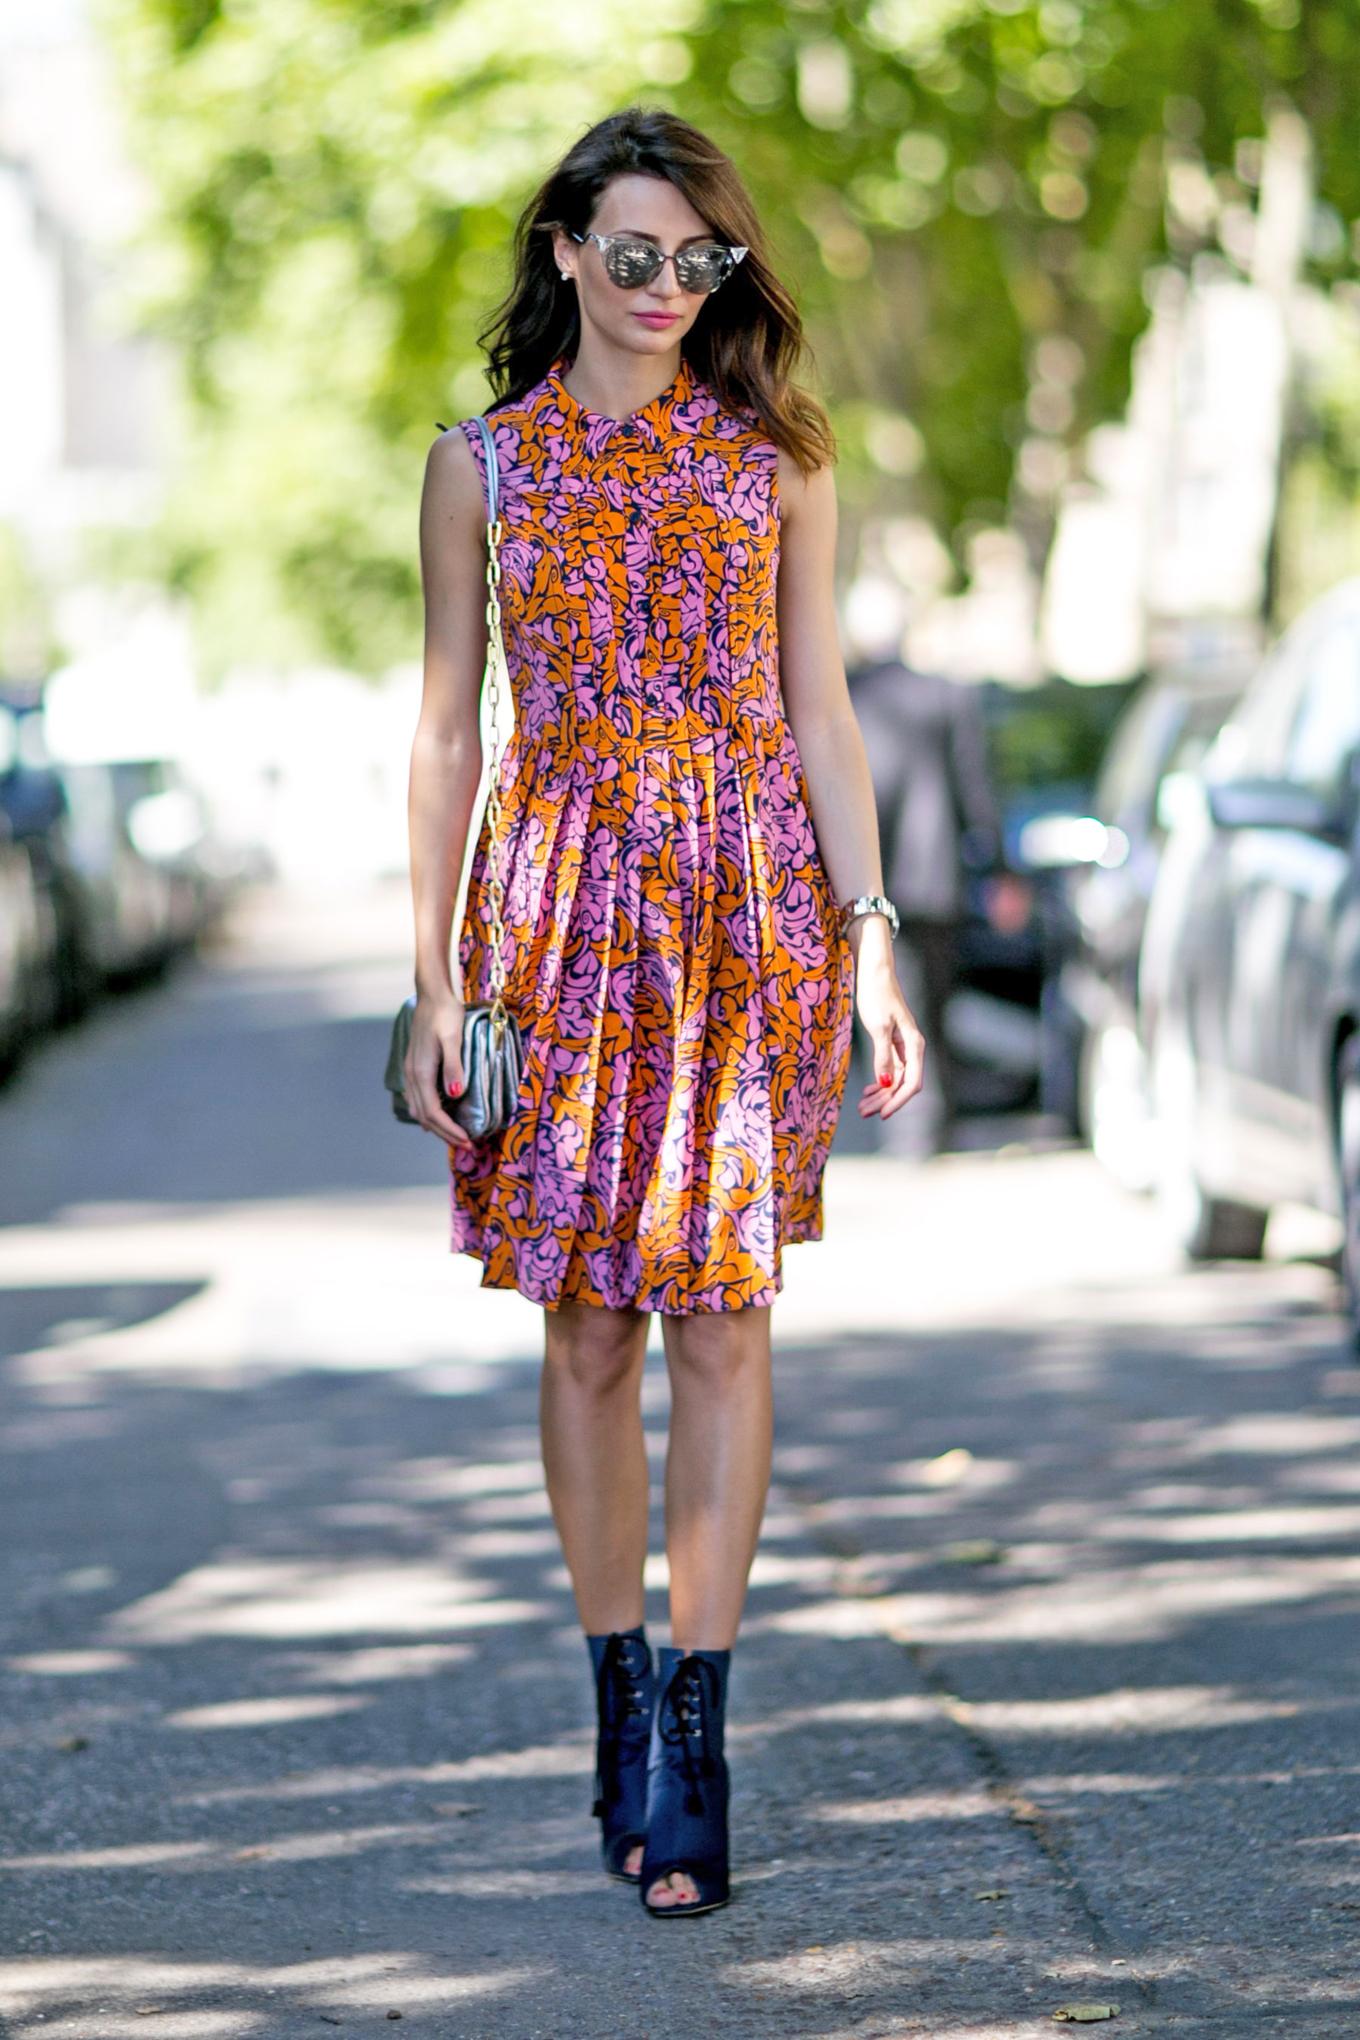 Outfit Matrimonio Uomo 2017 : Outfit matrimonio per l invitata i look moda primavera